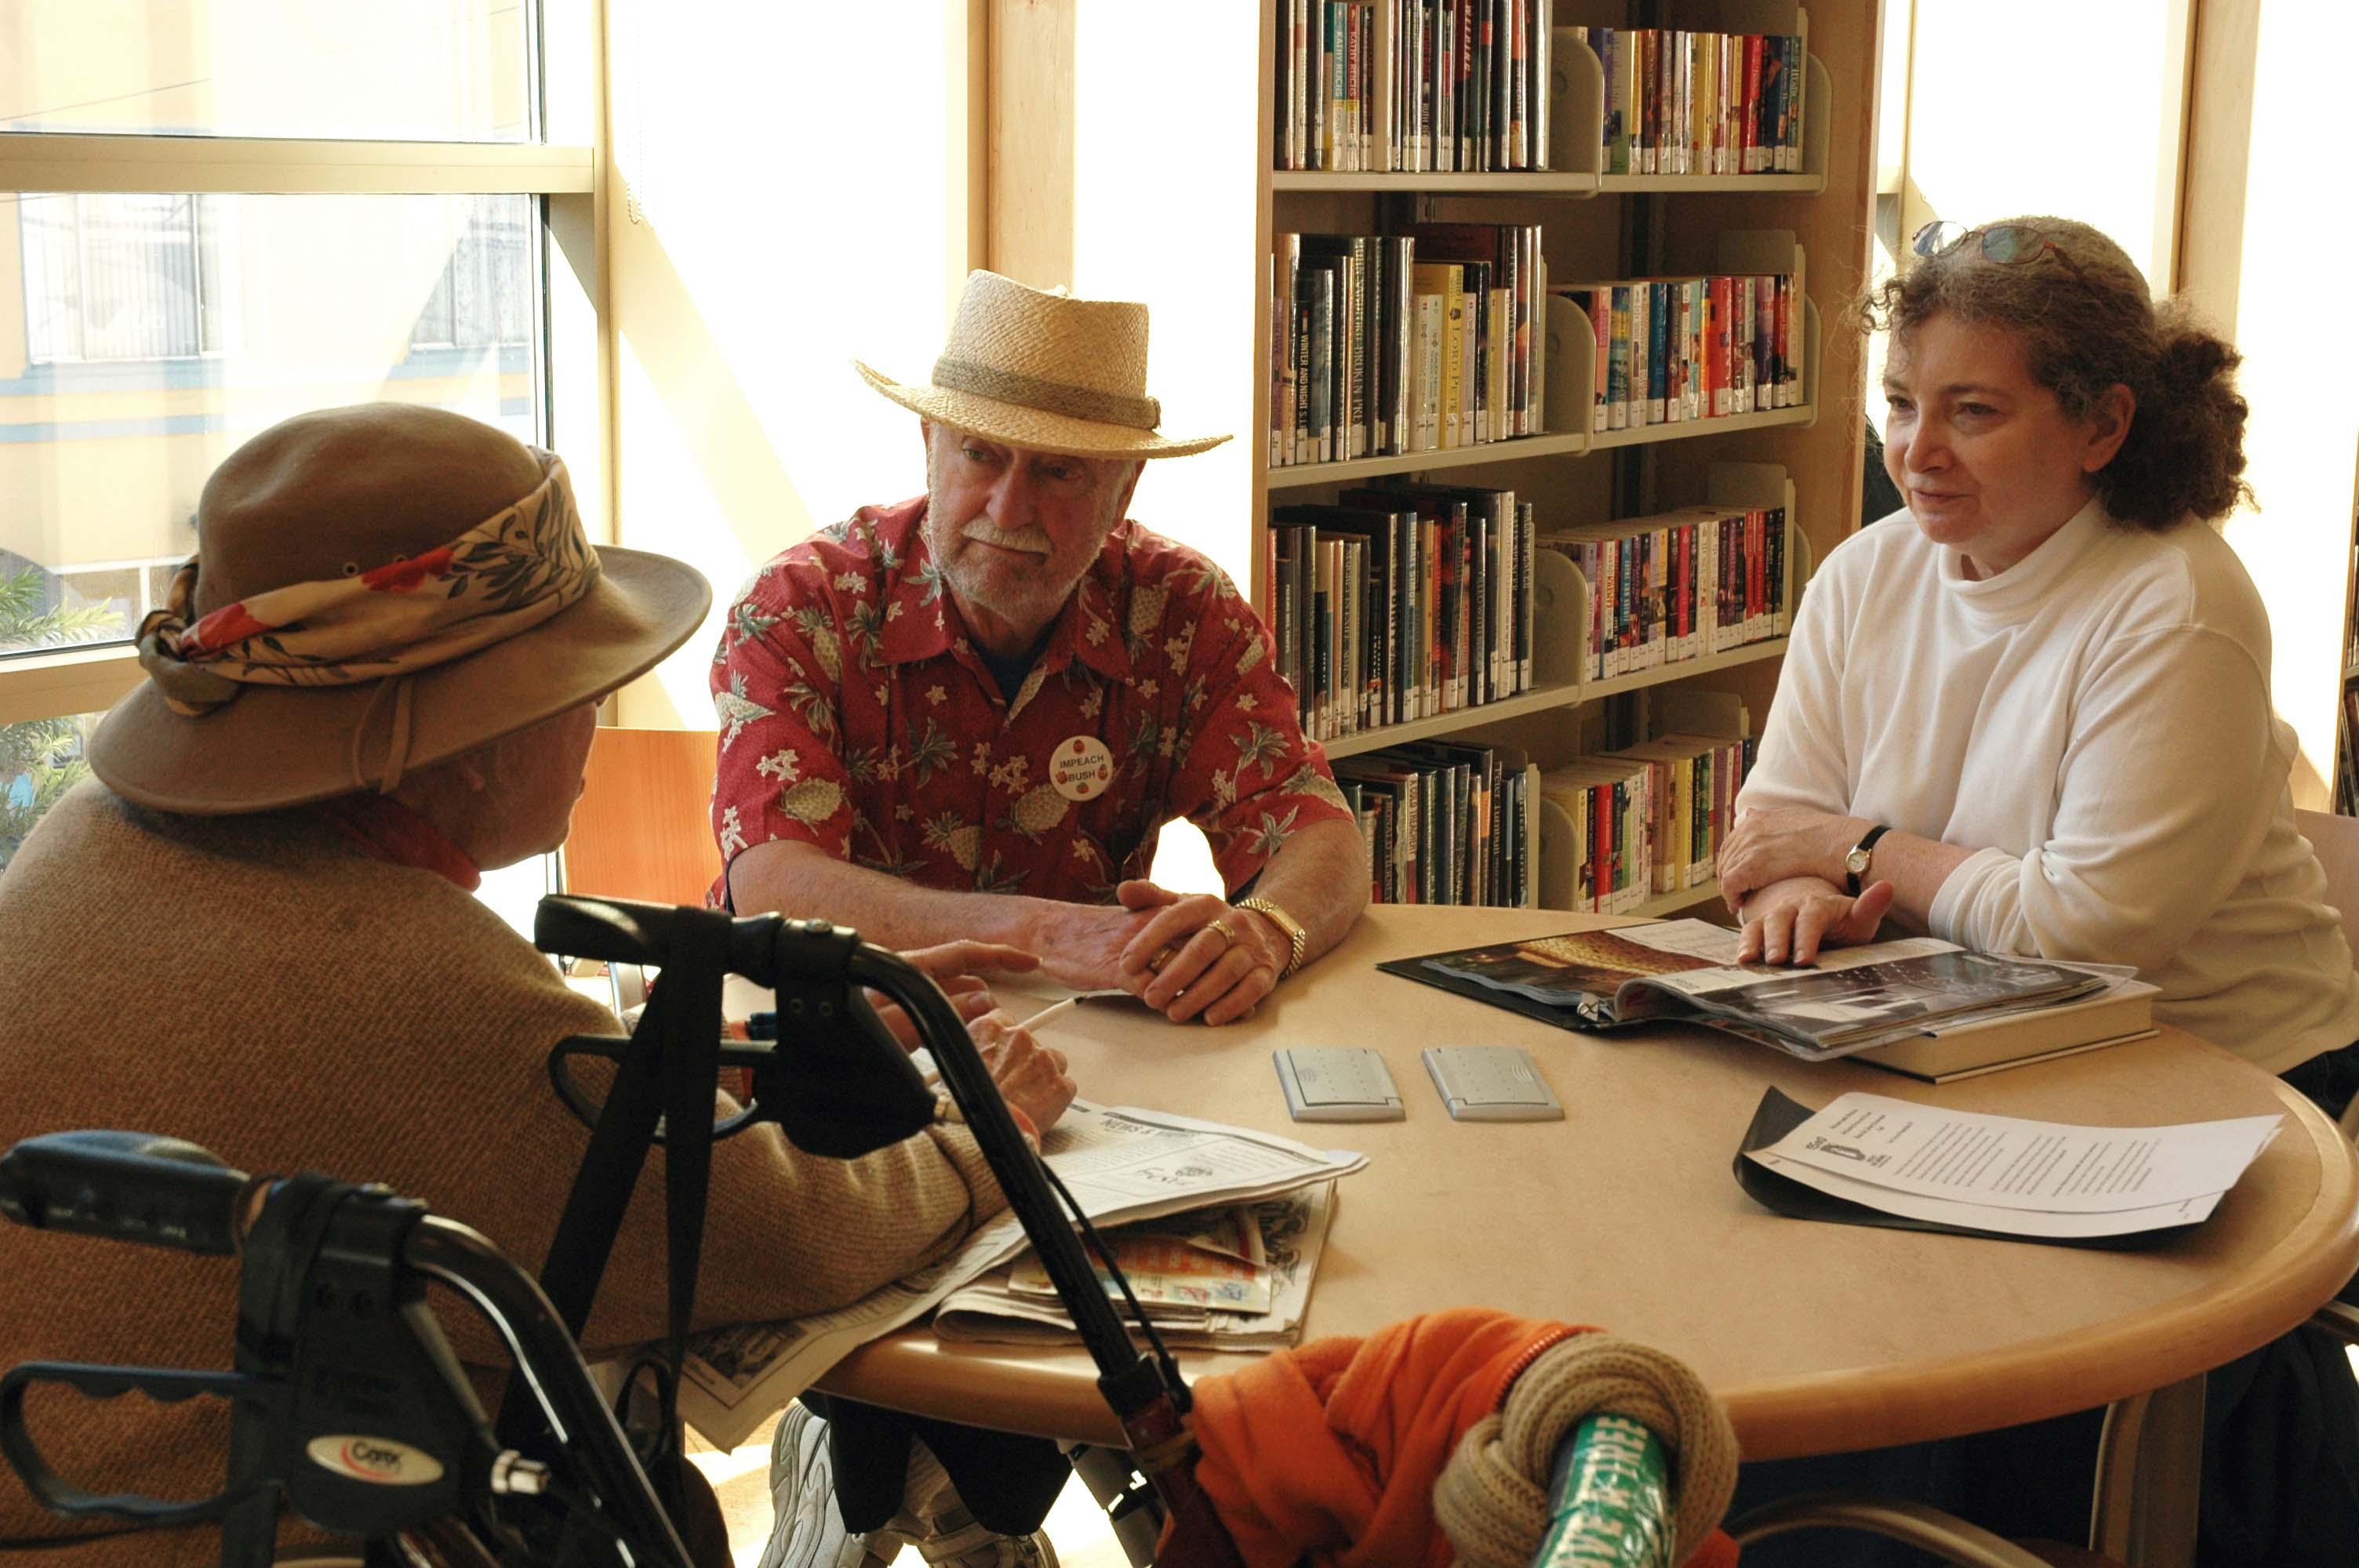 Seniors talking about books